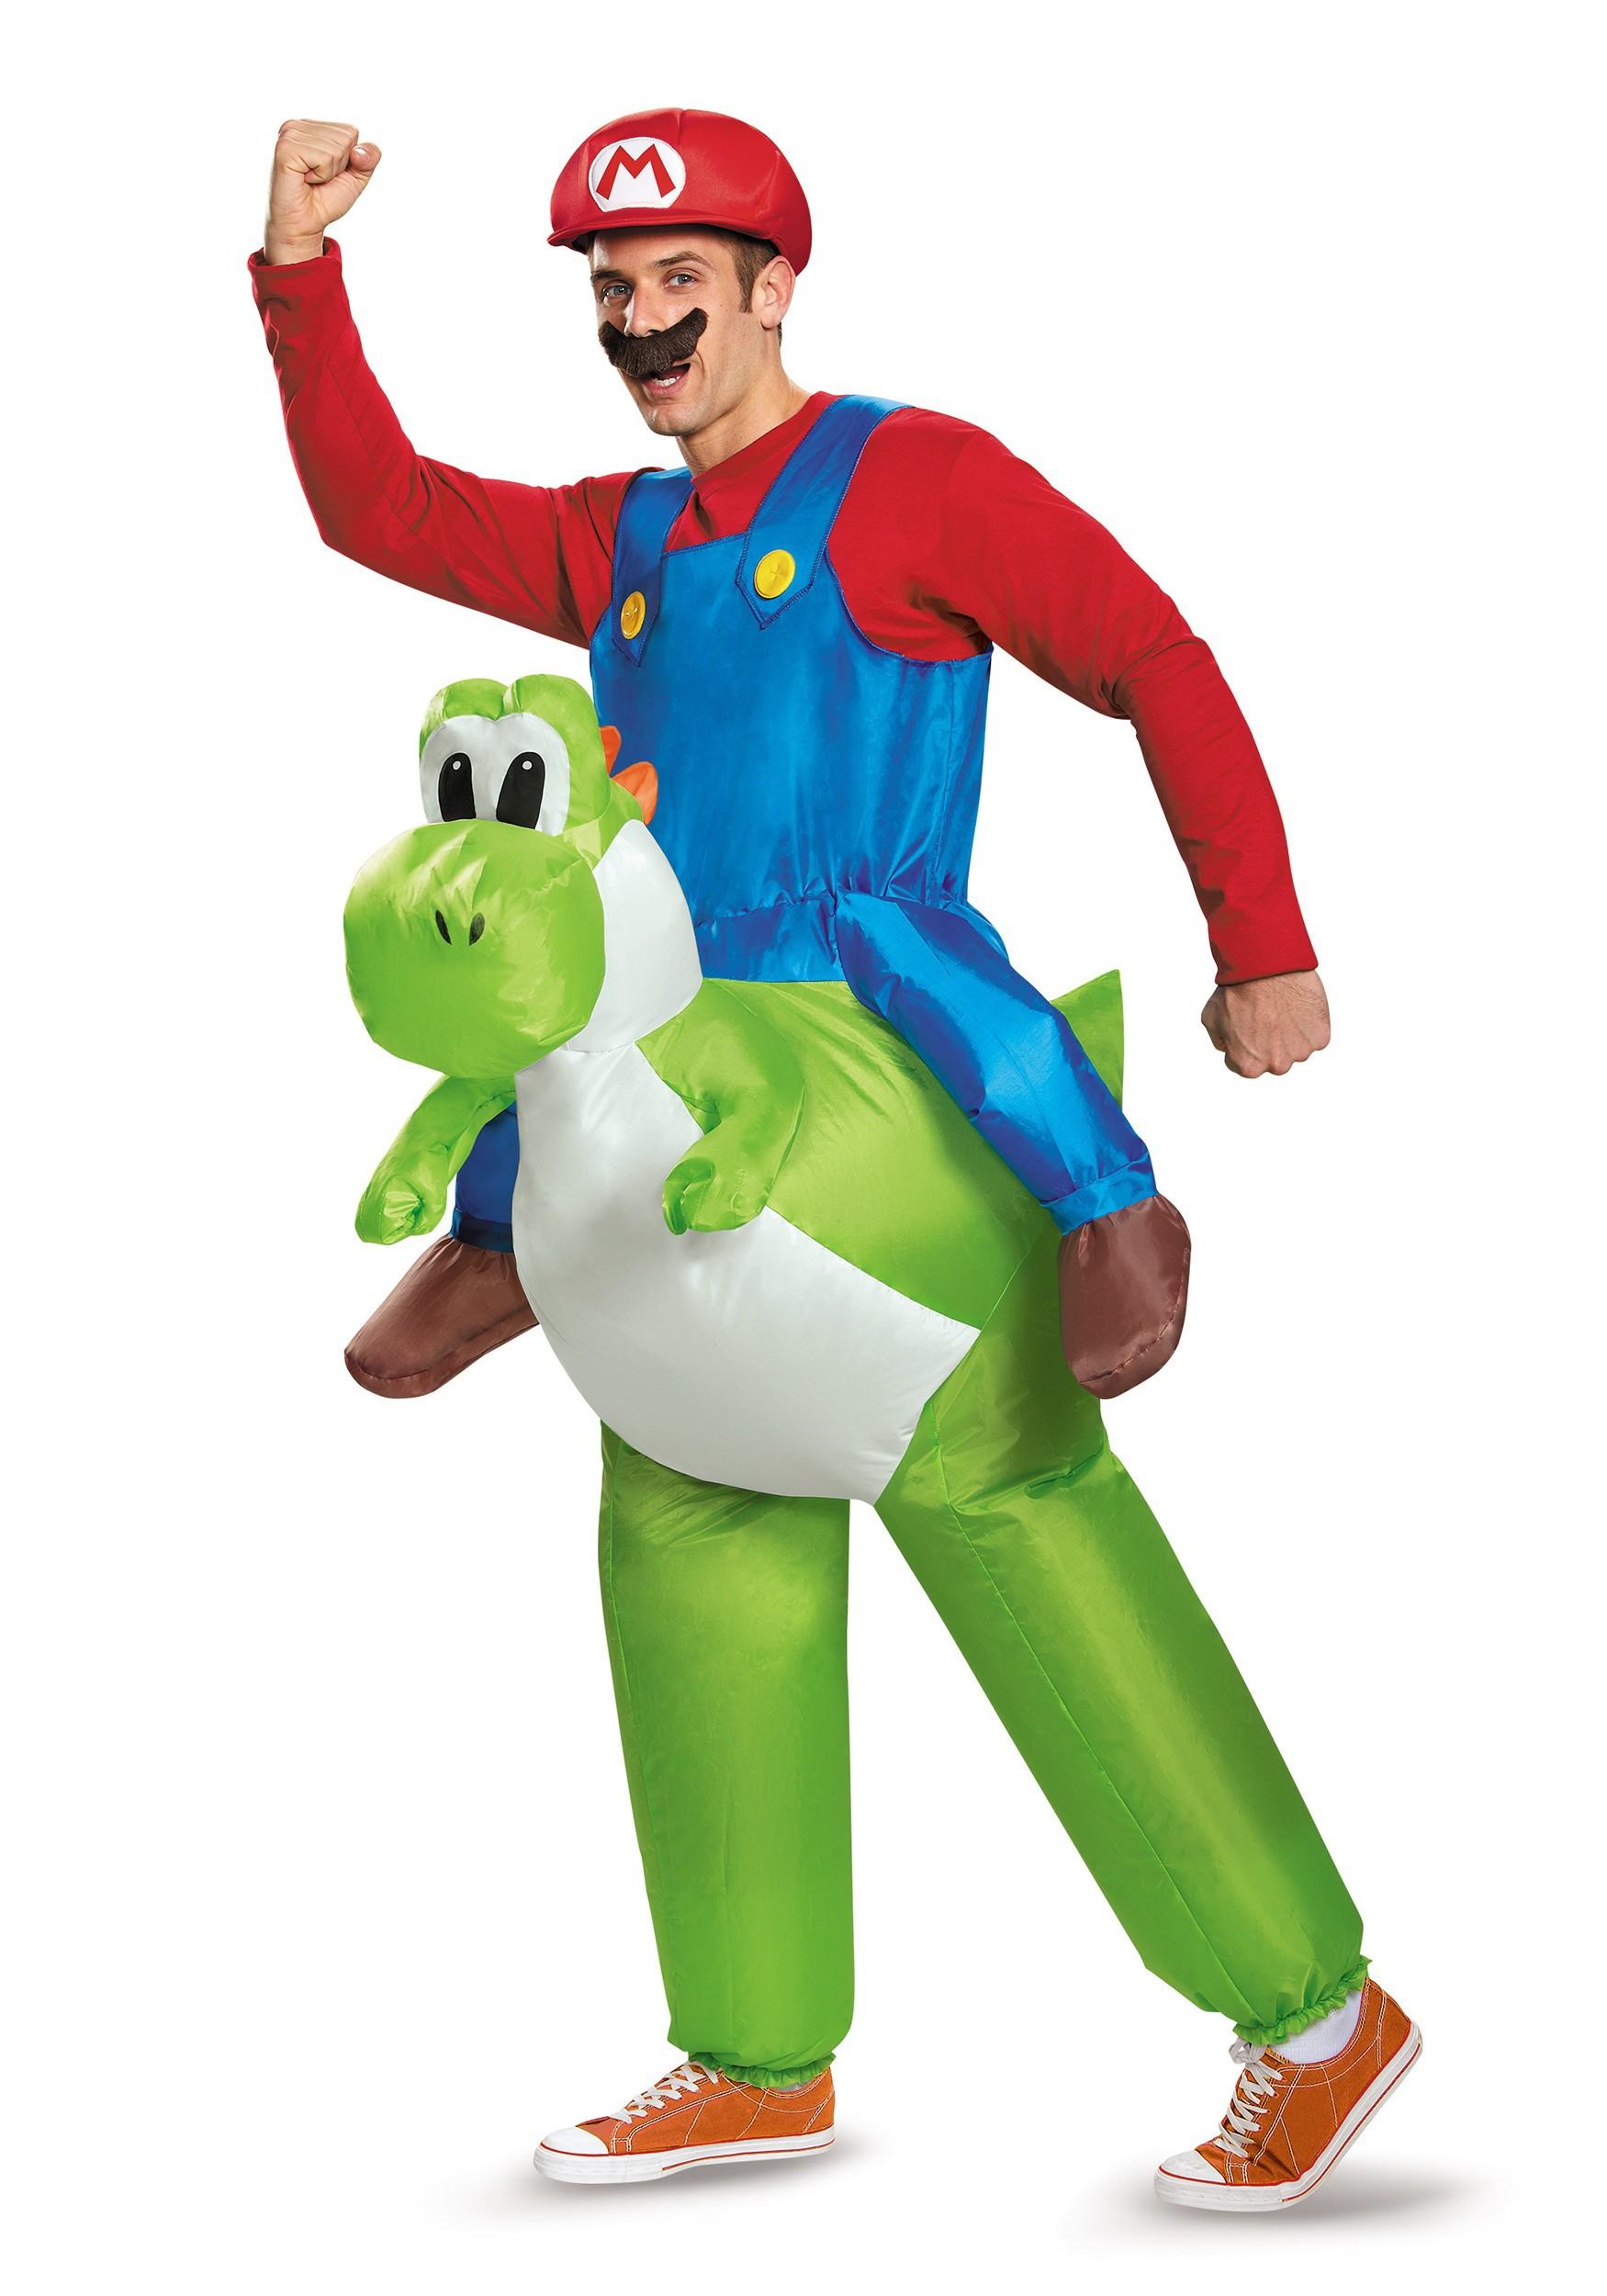 Mario And Luigi Halloween Costumes - HalloweenCostumes.com